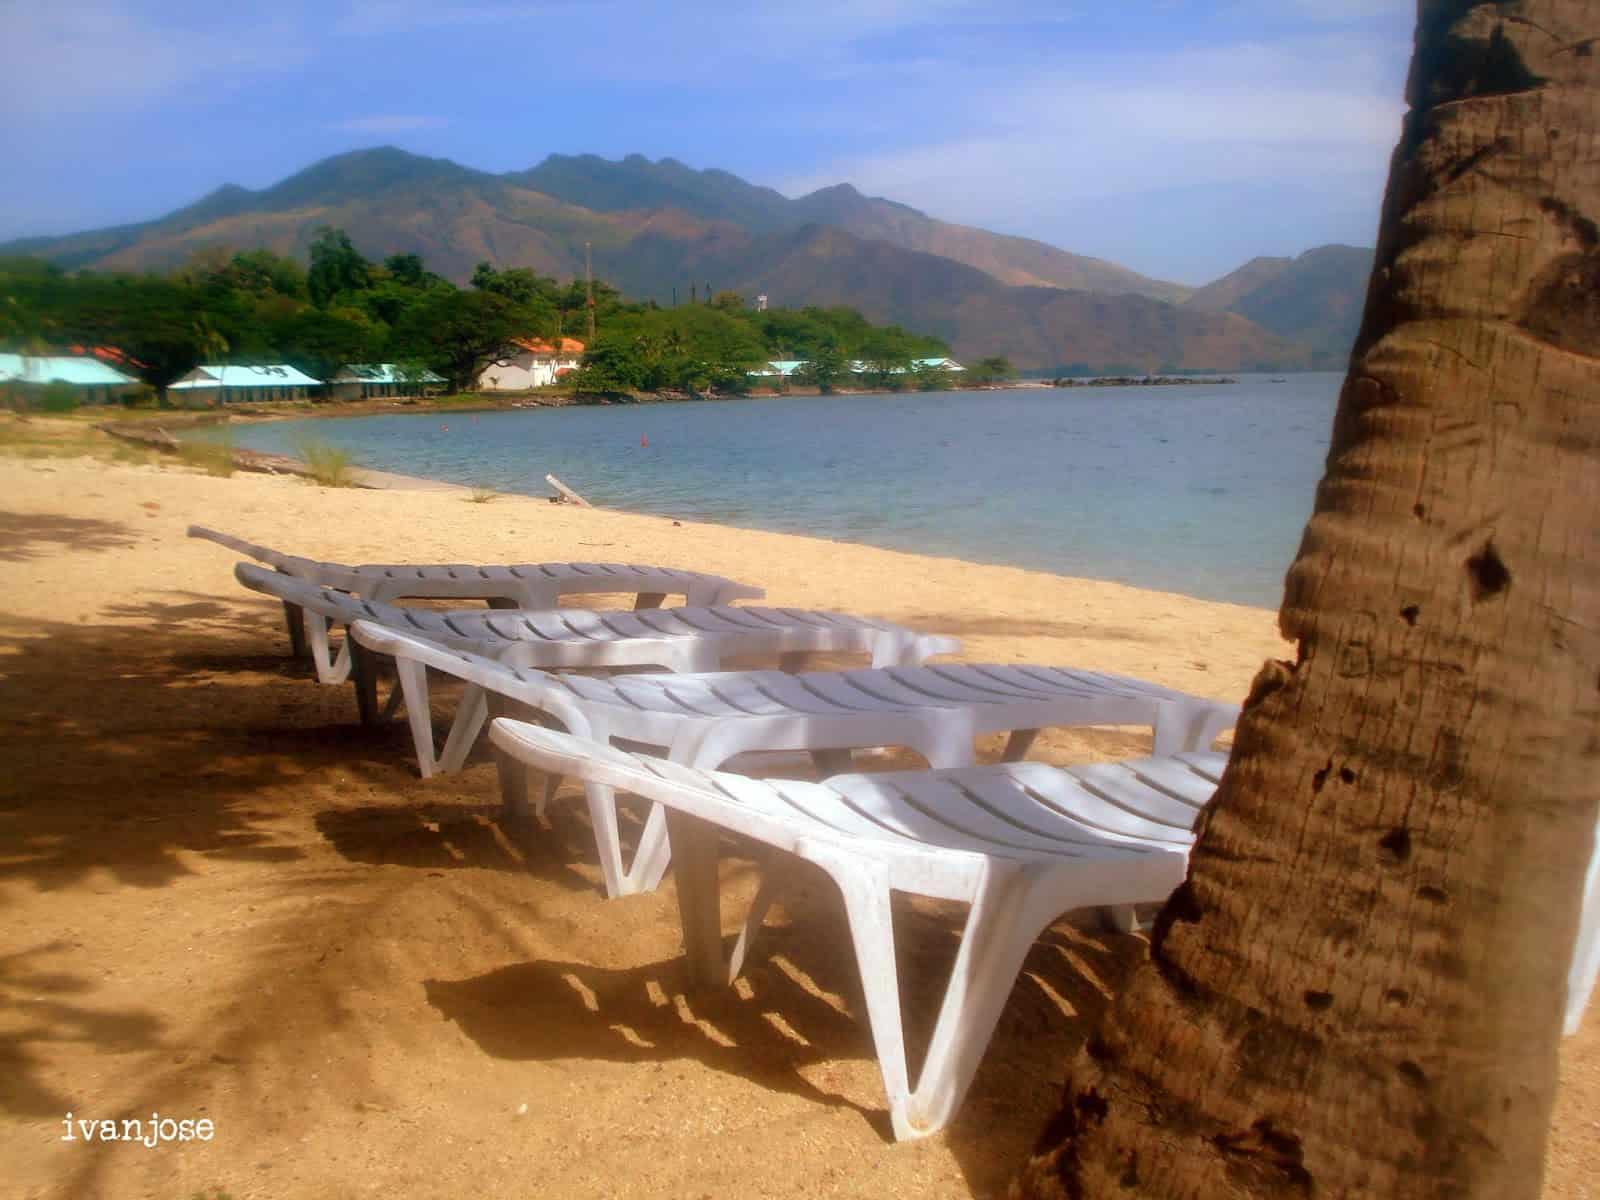 Beach benches at Grande Island Resort